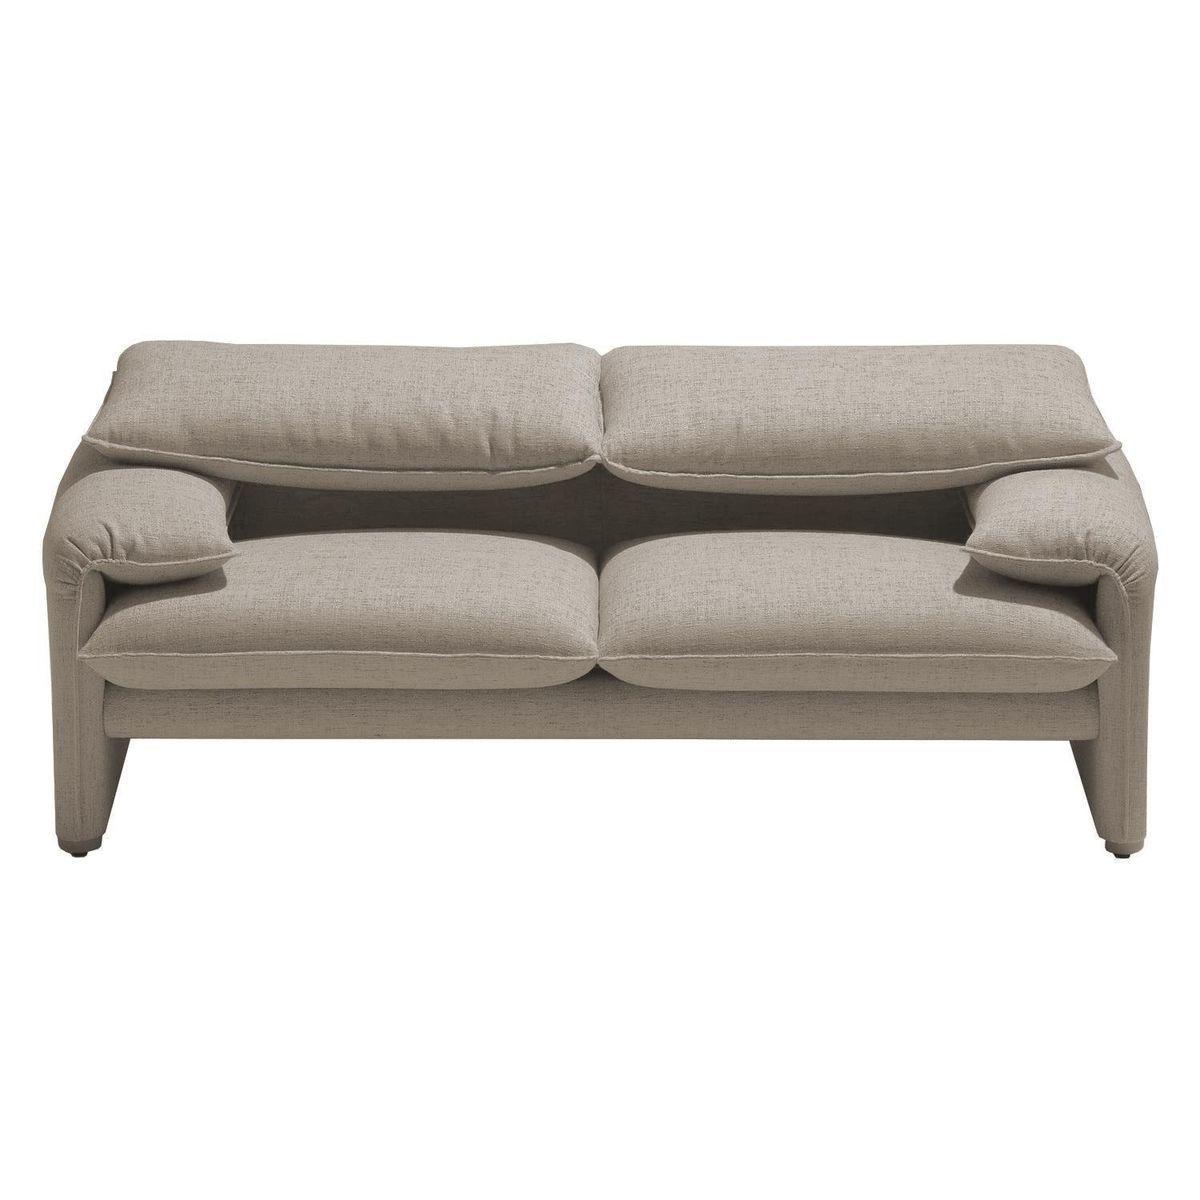 Maralunga 40 2 zits sofa 166x86cm cassina - Sofa zitter ...